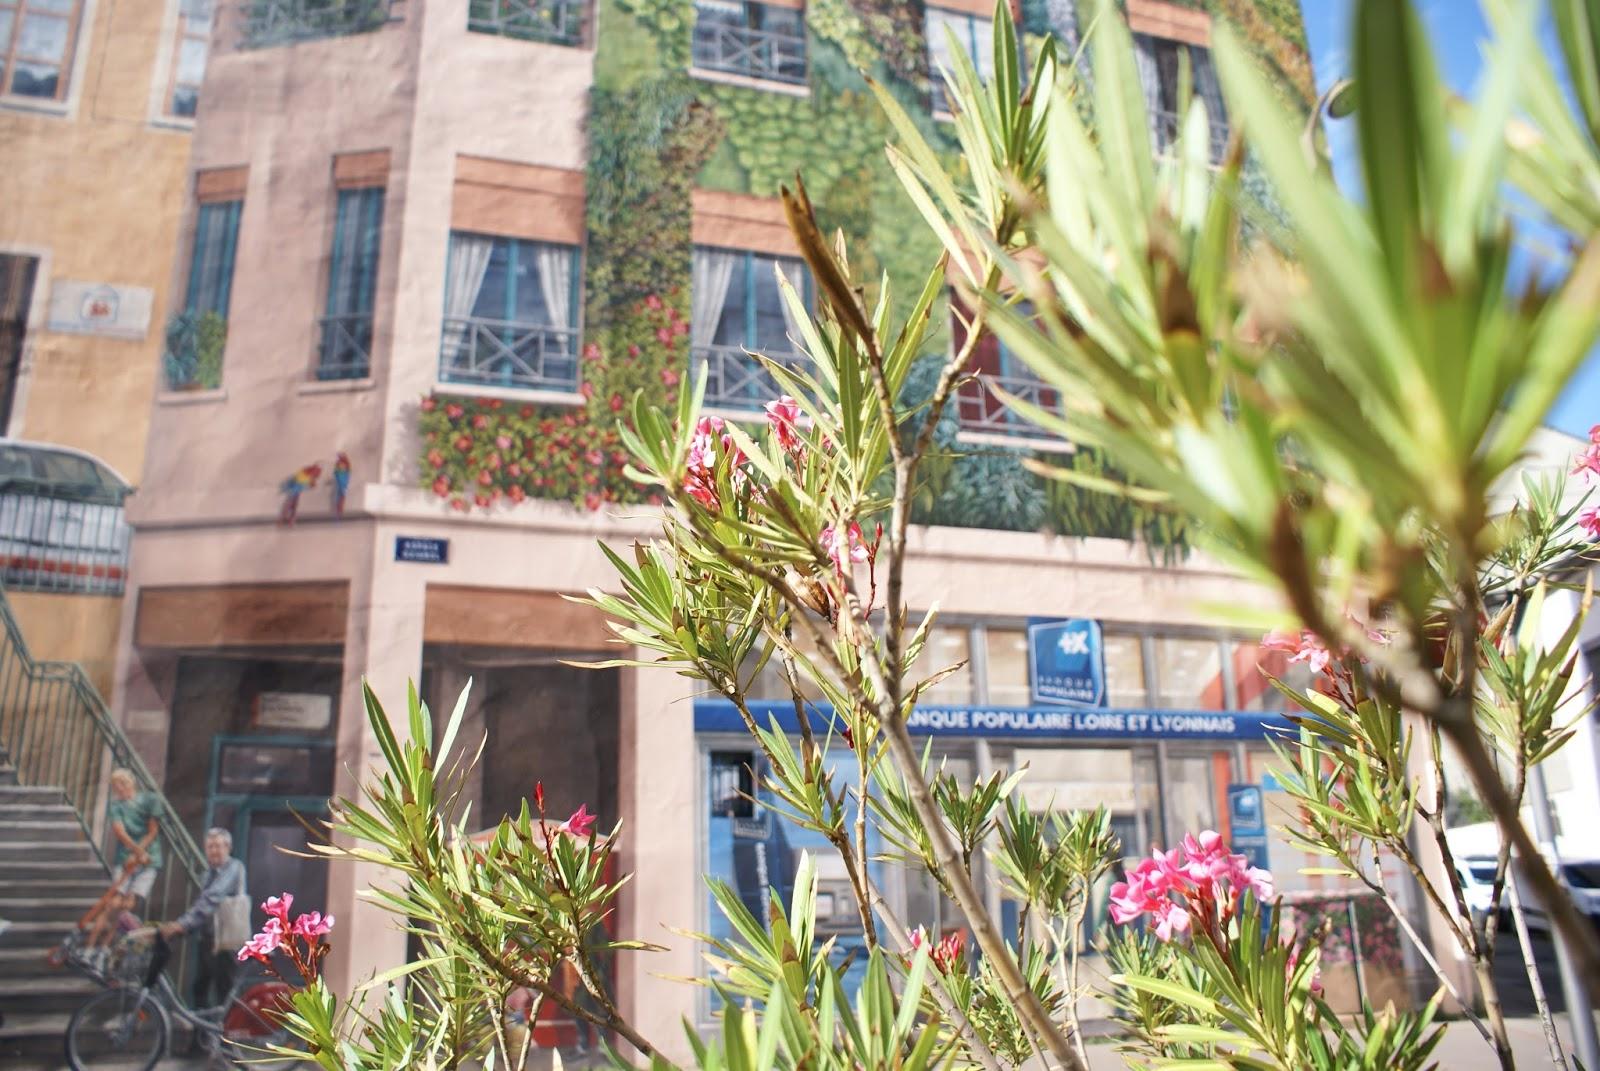 mur canuts croix rousse lyon rhône alpes blogtrip synbud